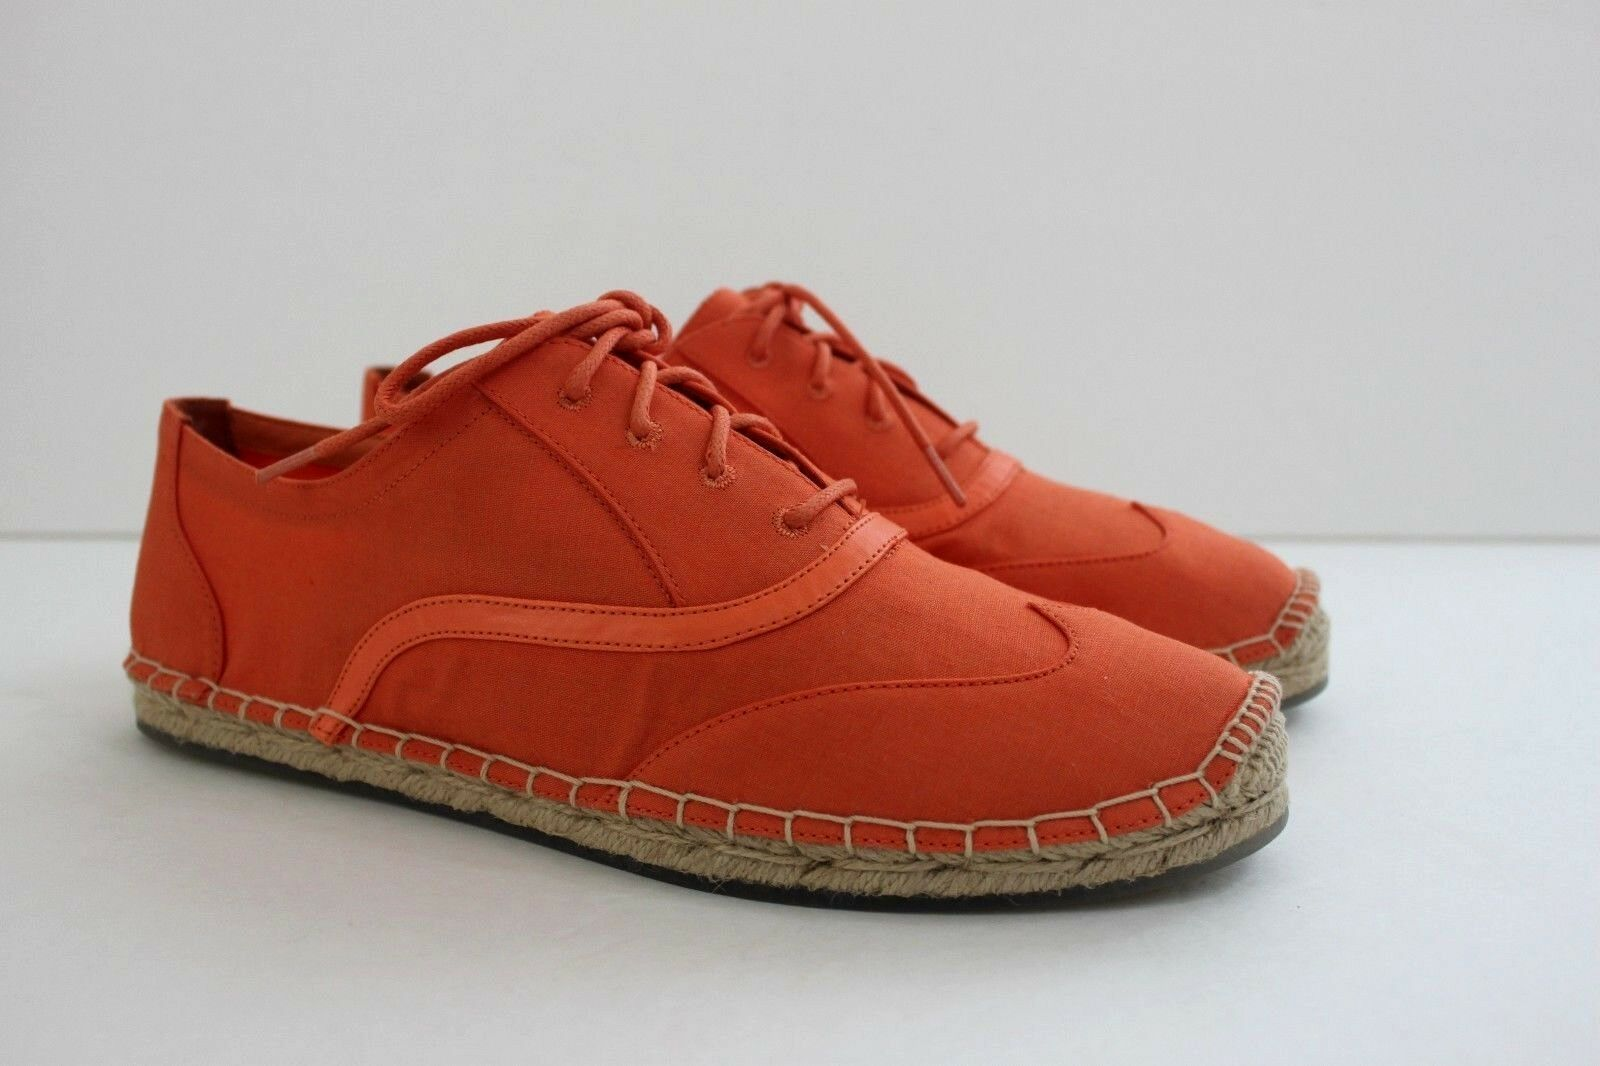 Cole Haan Damenschuhe Schuhe Größe 7 B Creamsicle Canvas Espadadrille Loafer Flat Oxford